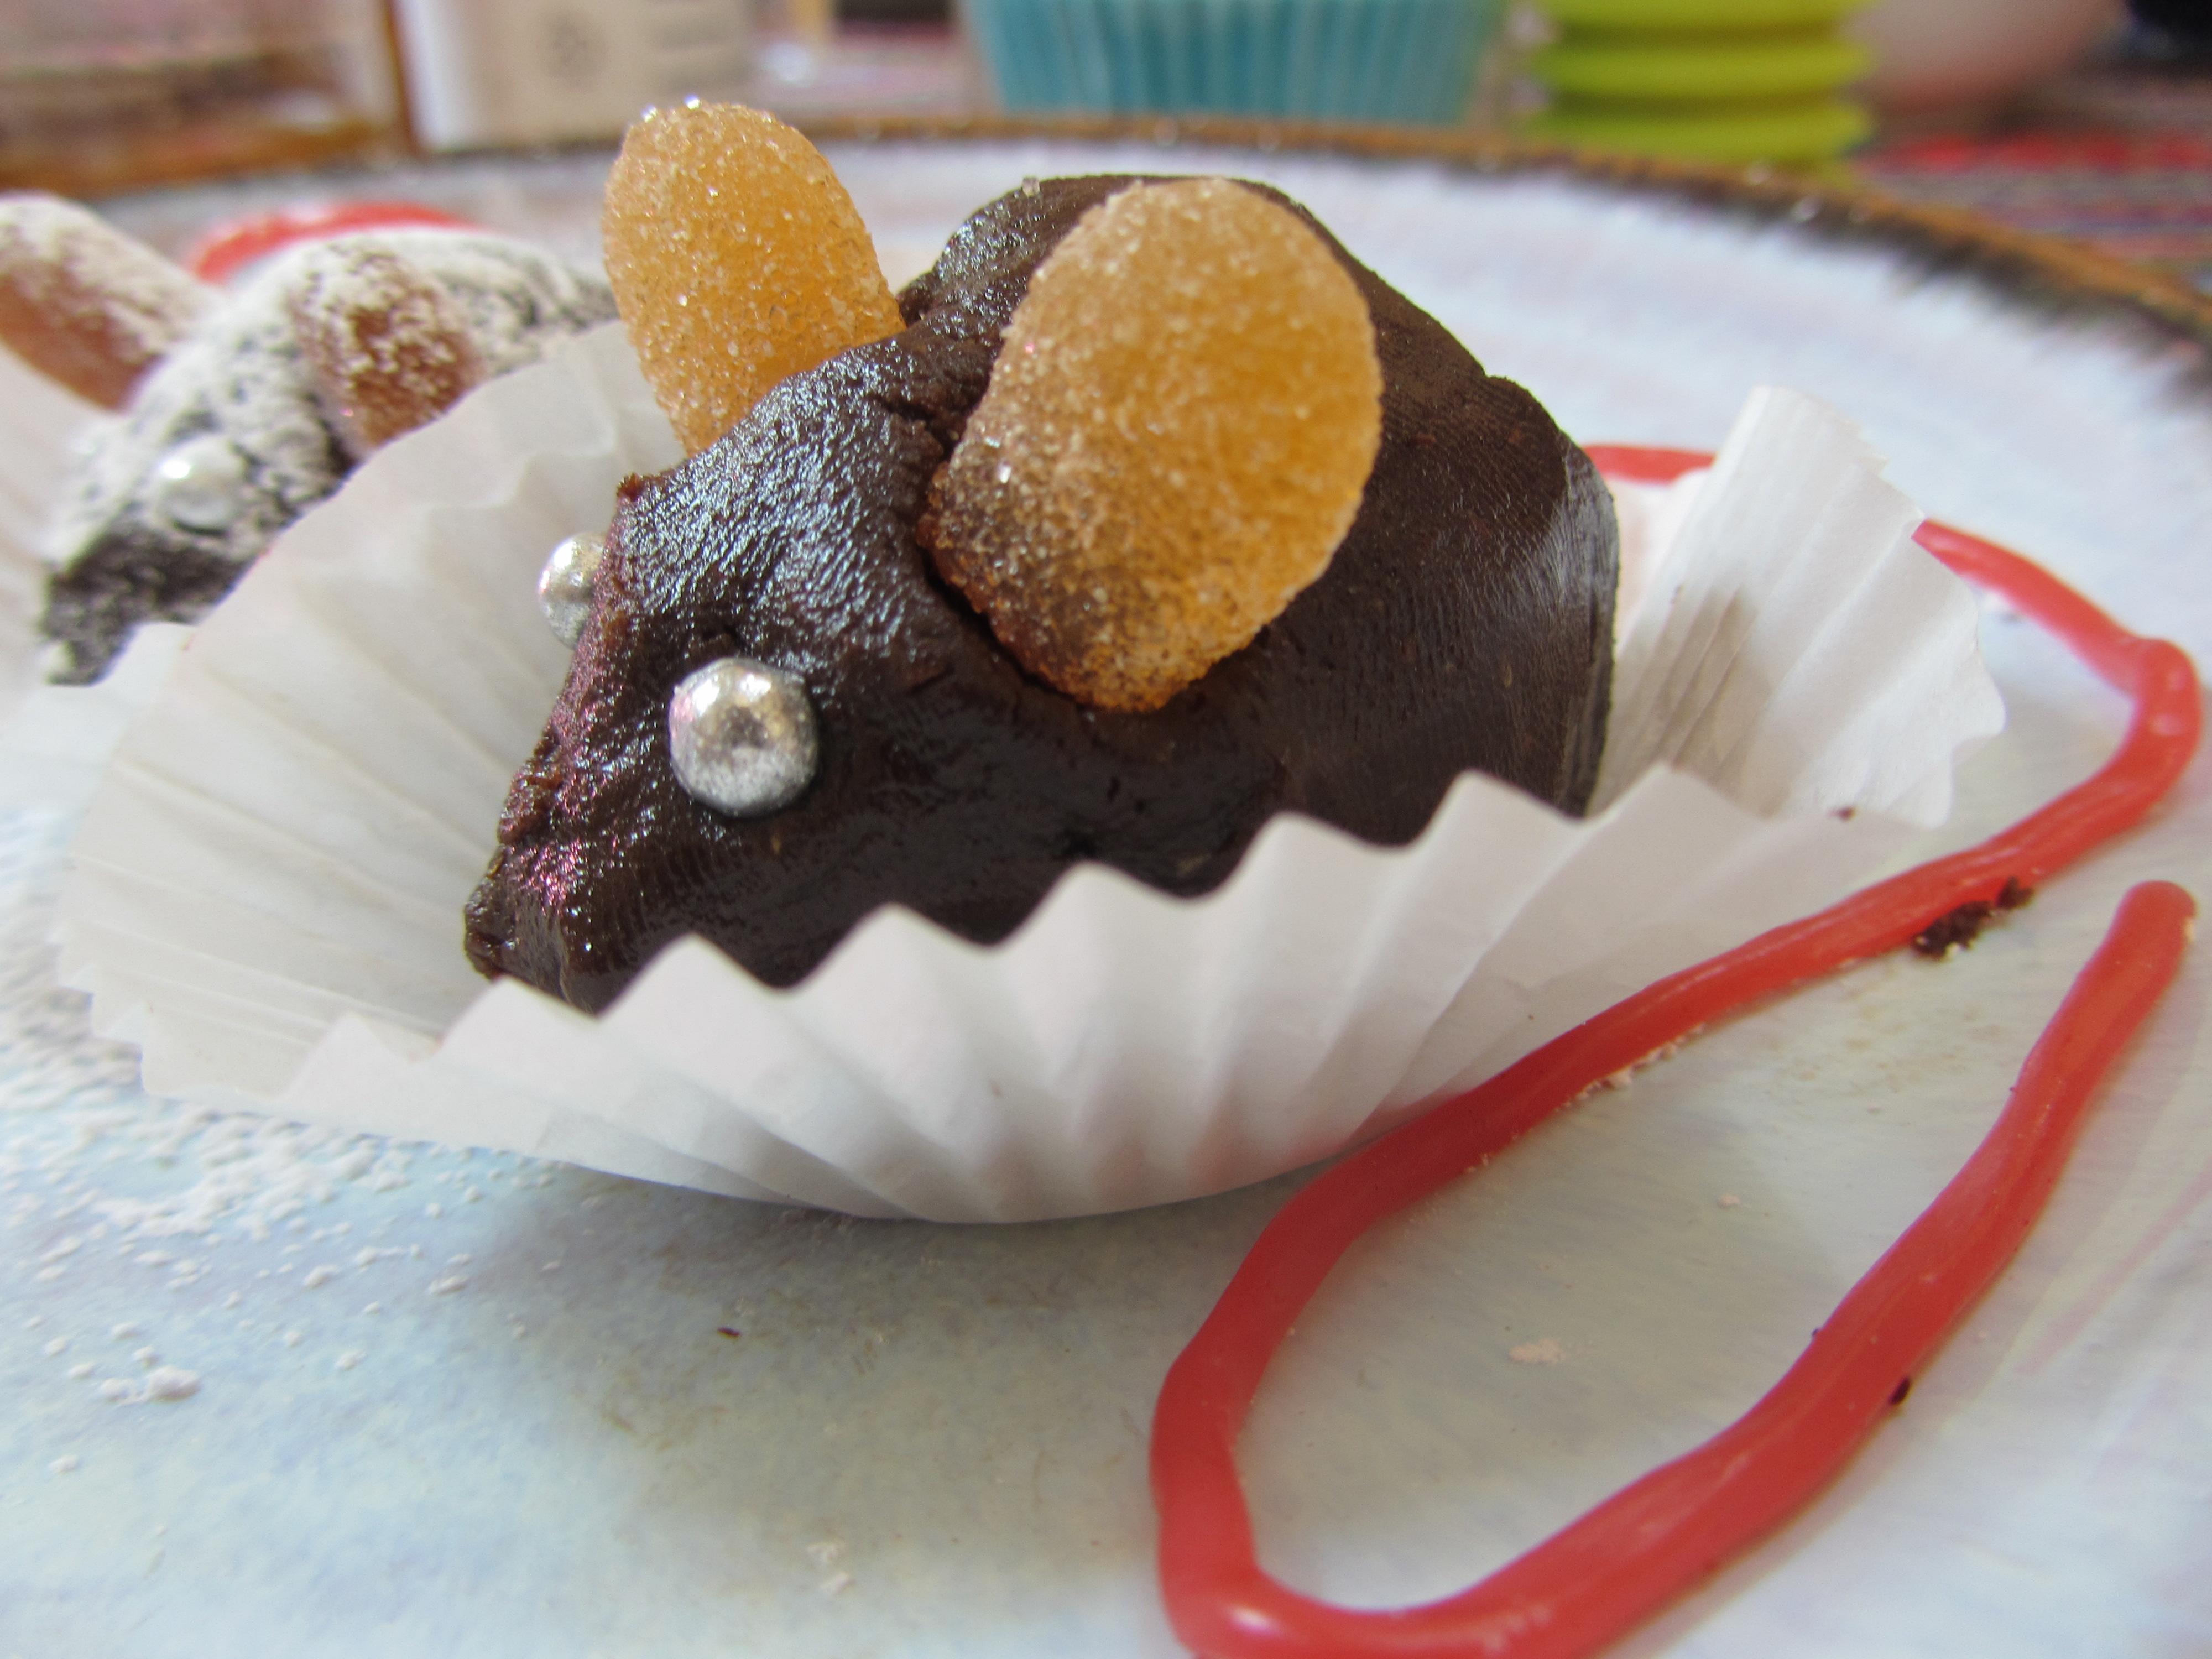 Cute Chocolate Mice